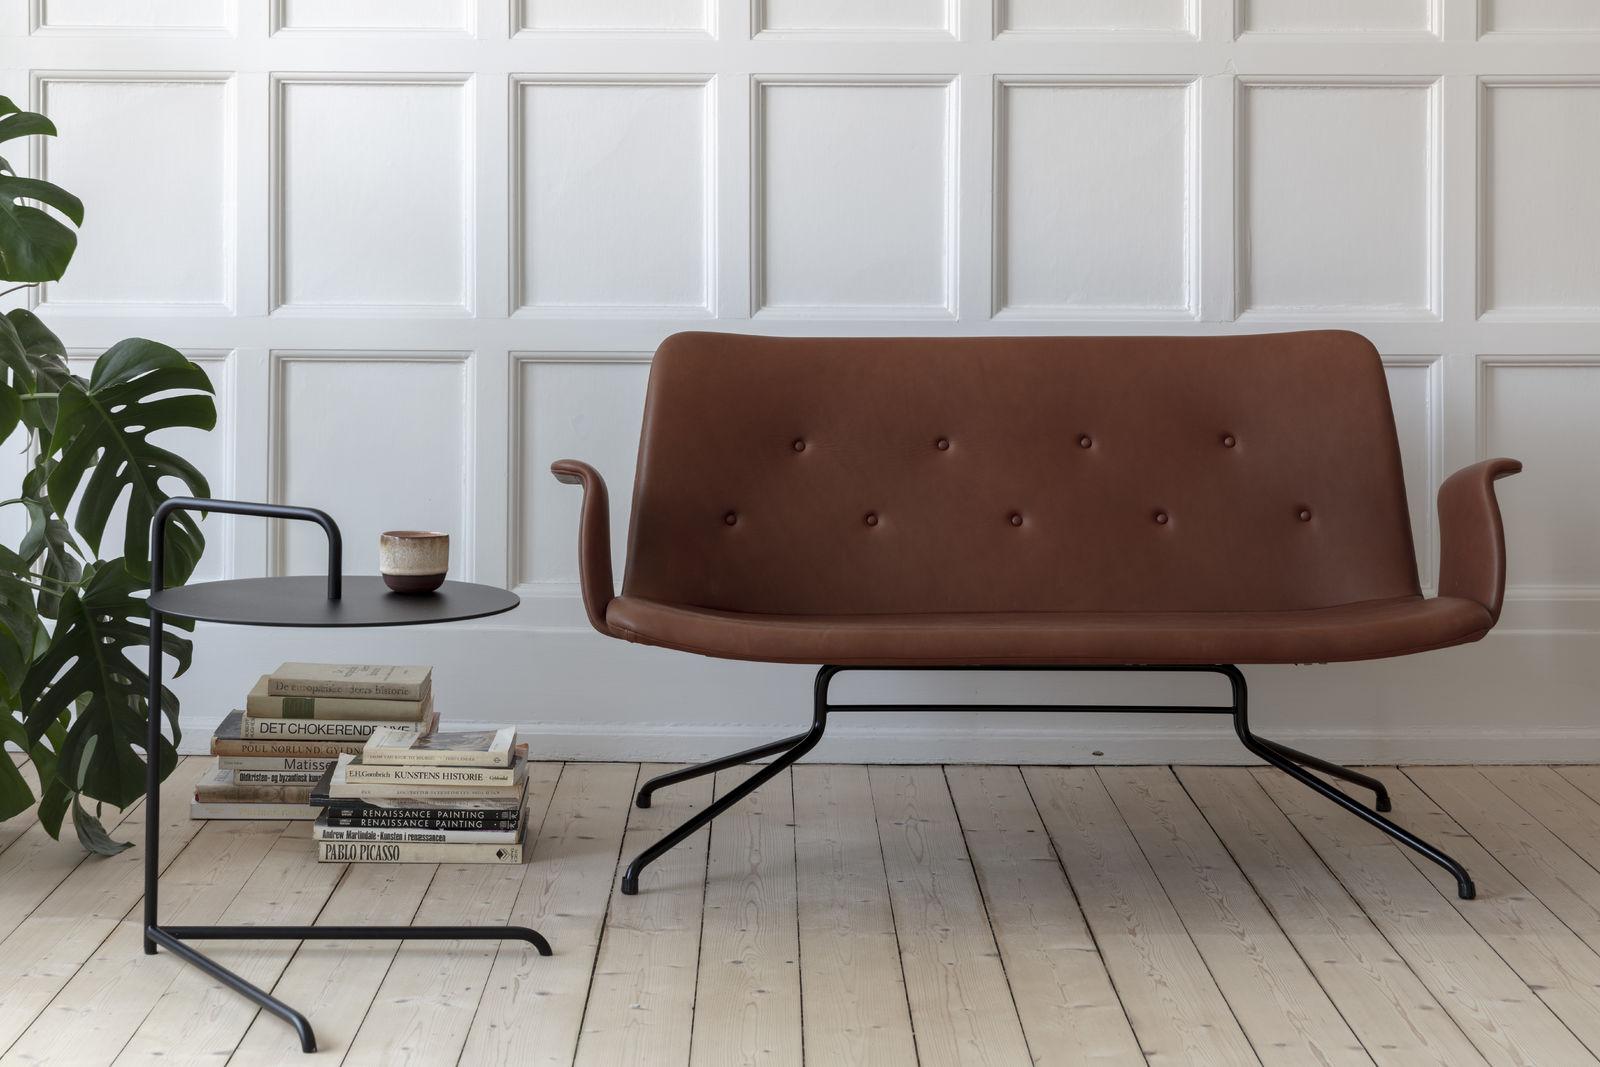 New Office Primum Sofa Davos Brown HOVED